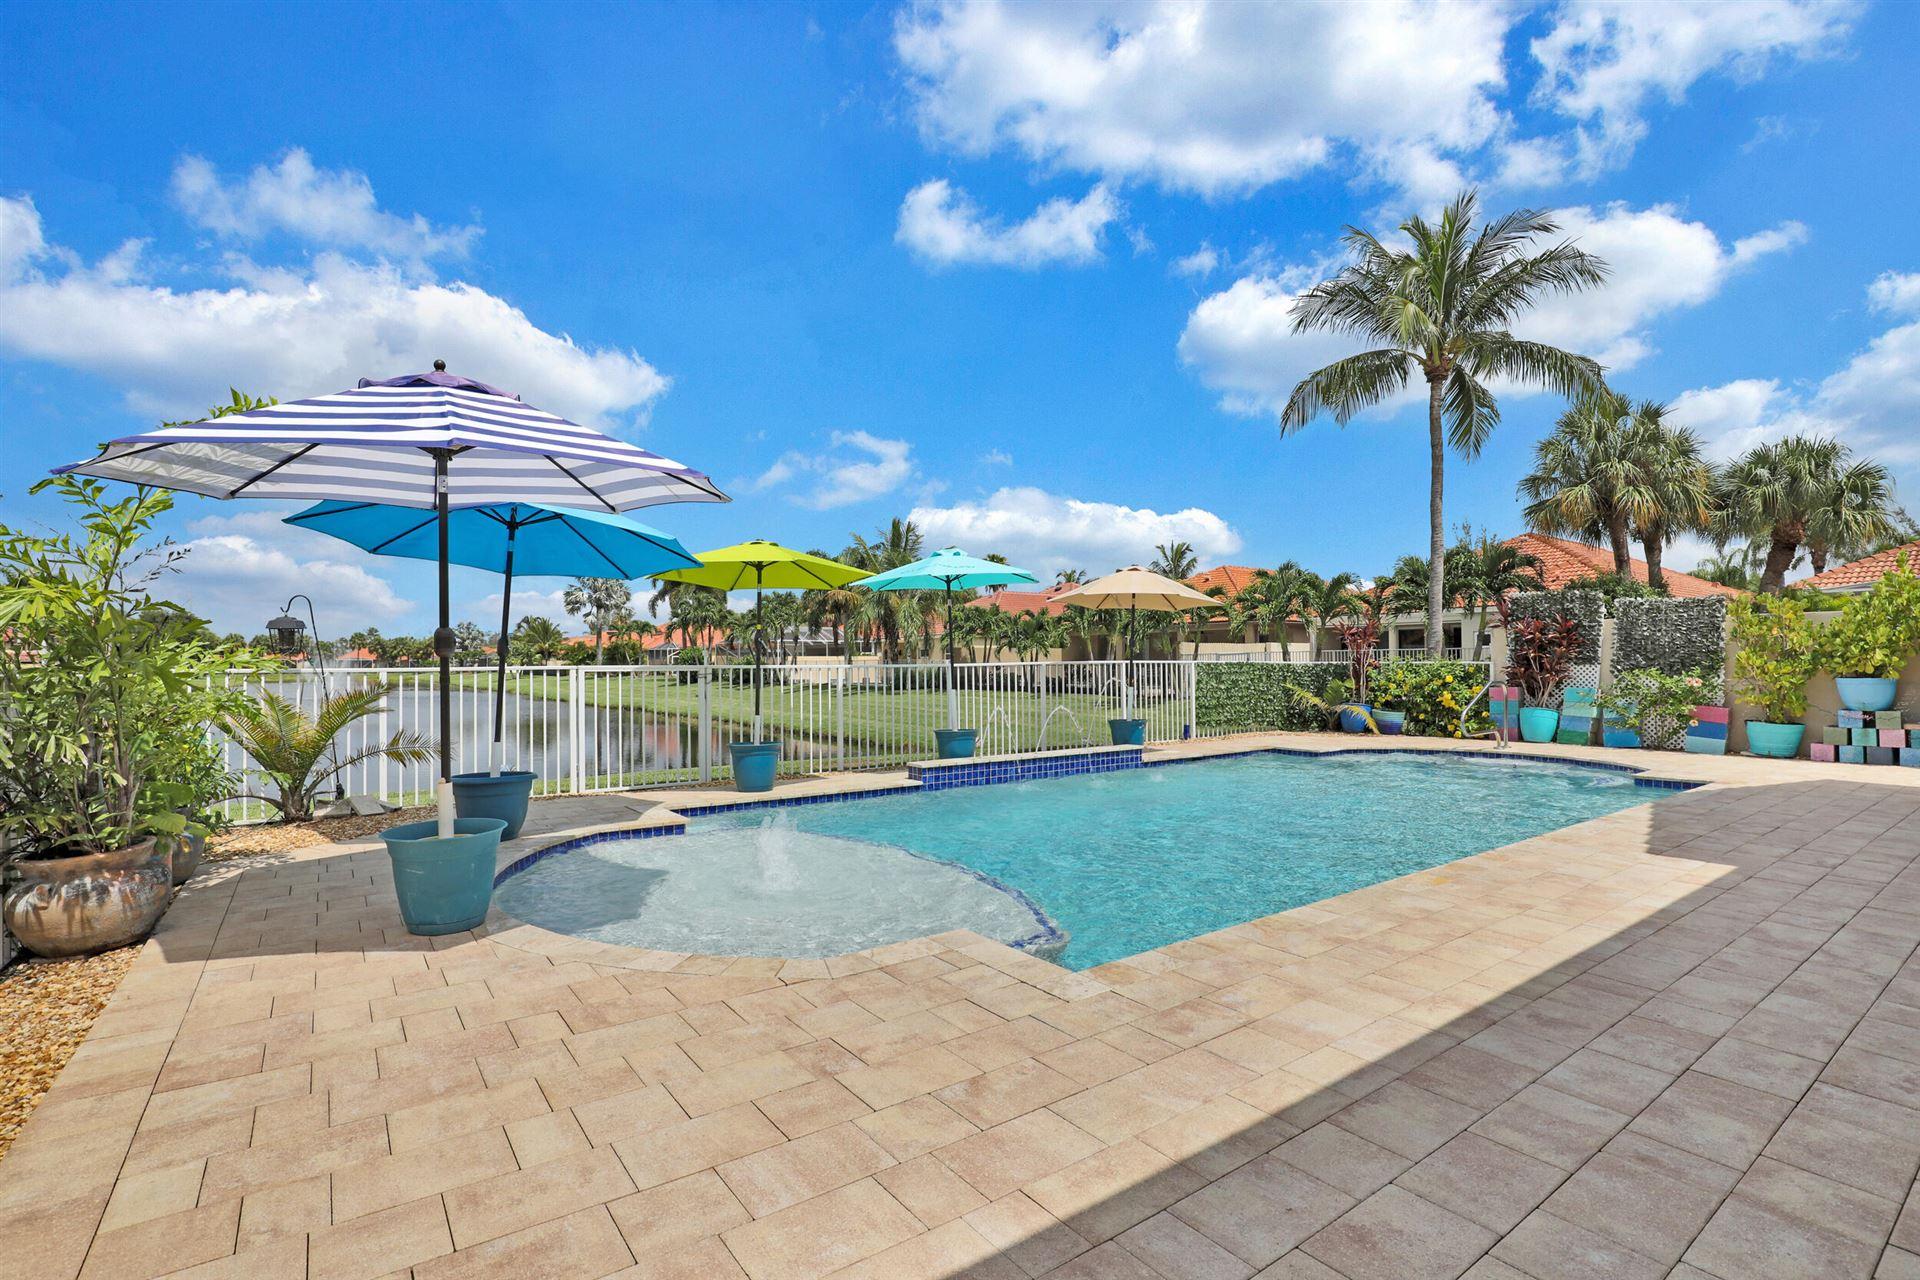 8083 Sago Palm Lane, Boynton Beach, FL 33436 - MLS#: RX-10731159